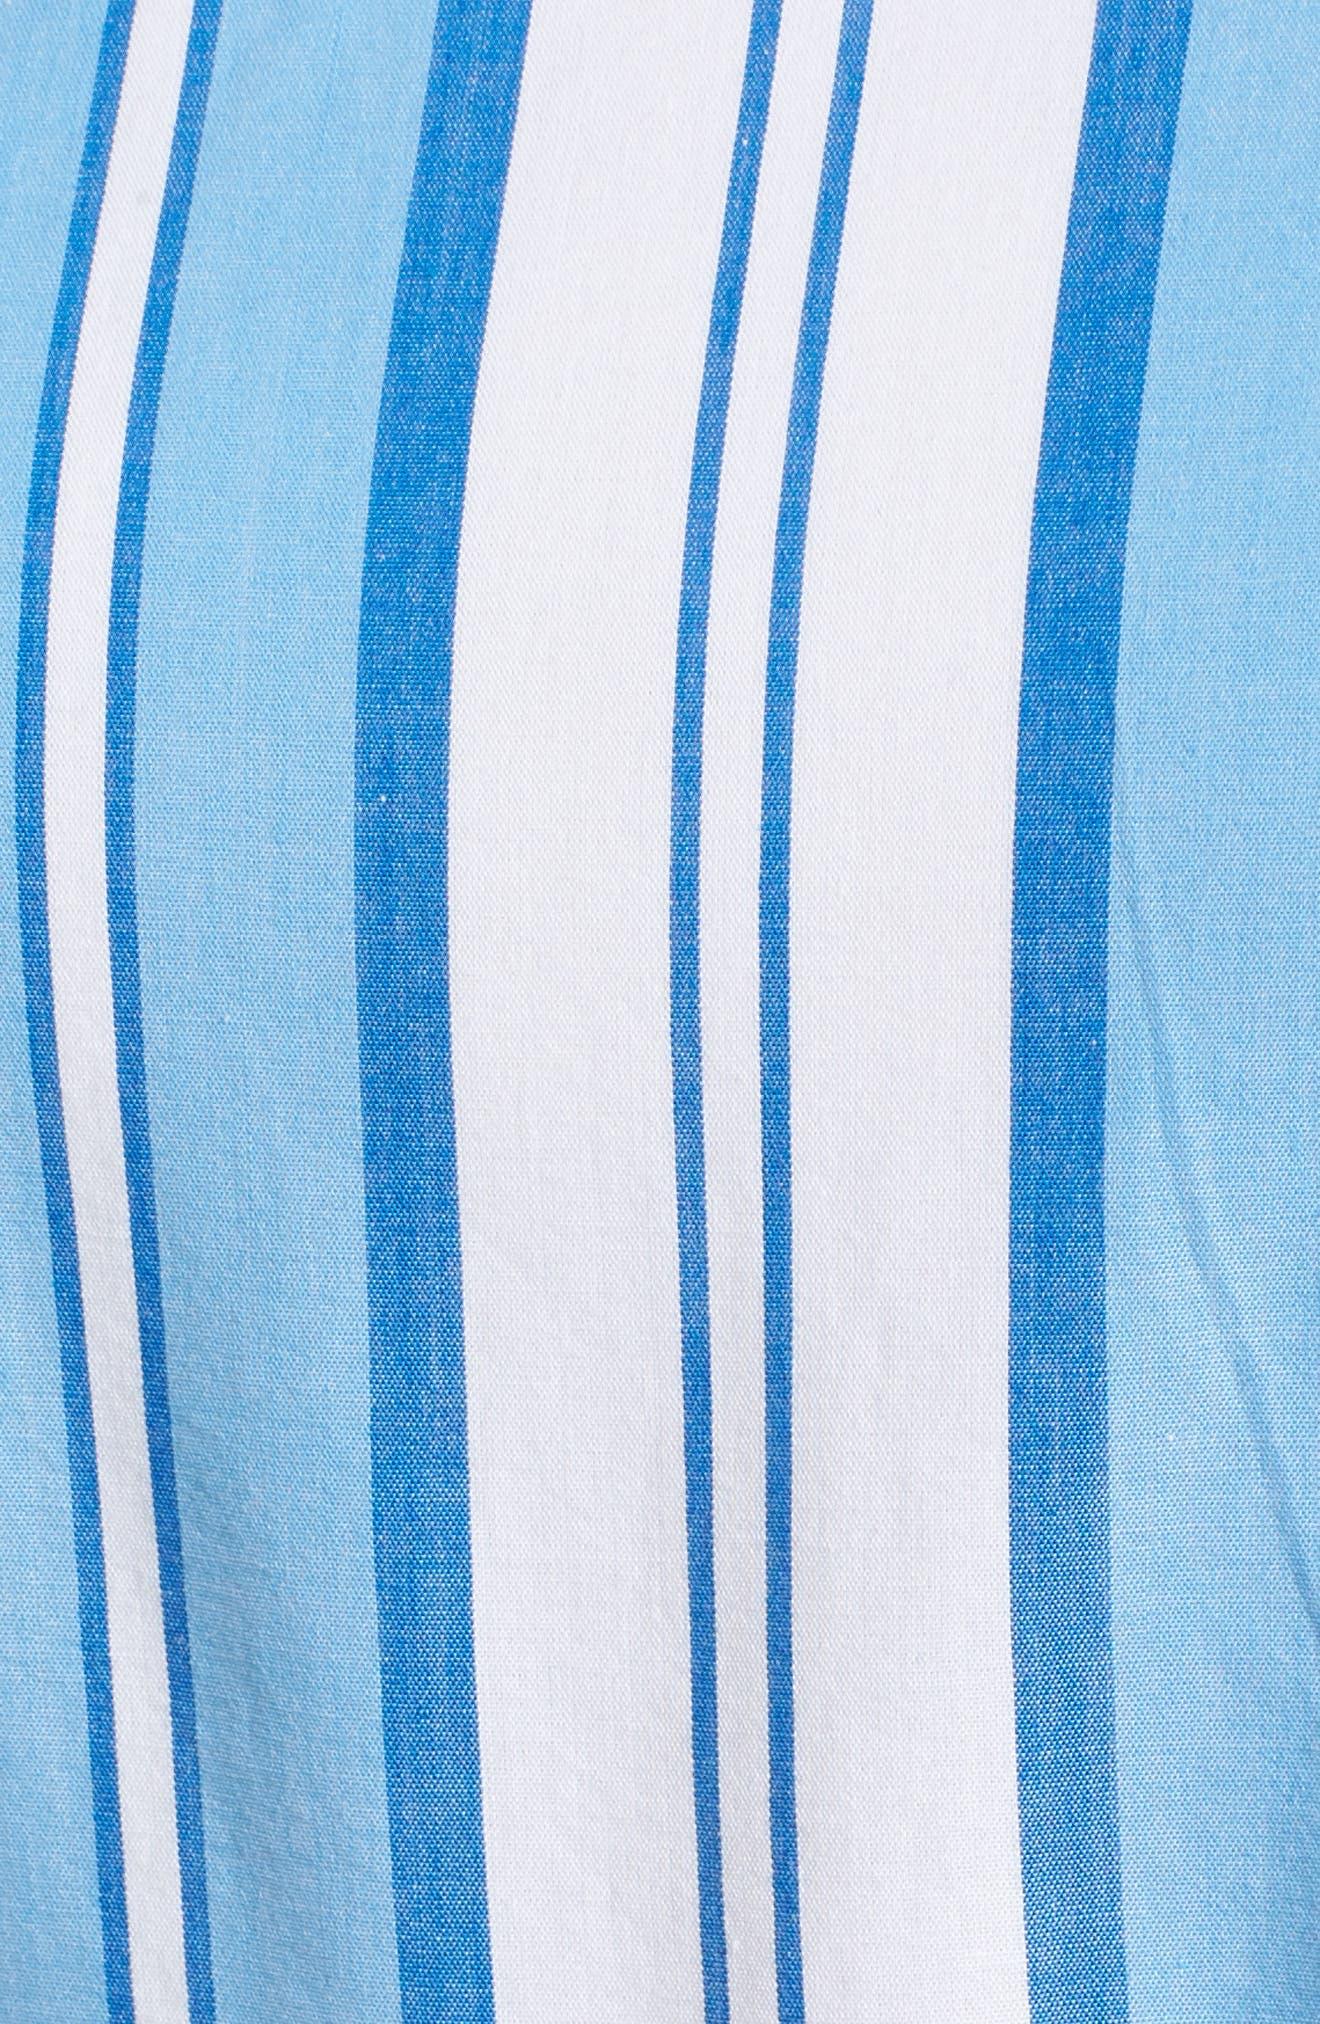 Ocean Stripe Tiered Maxi Dress,                             Alternate thumbnail 5, color,